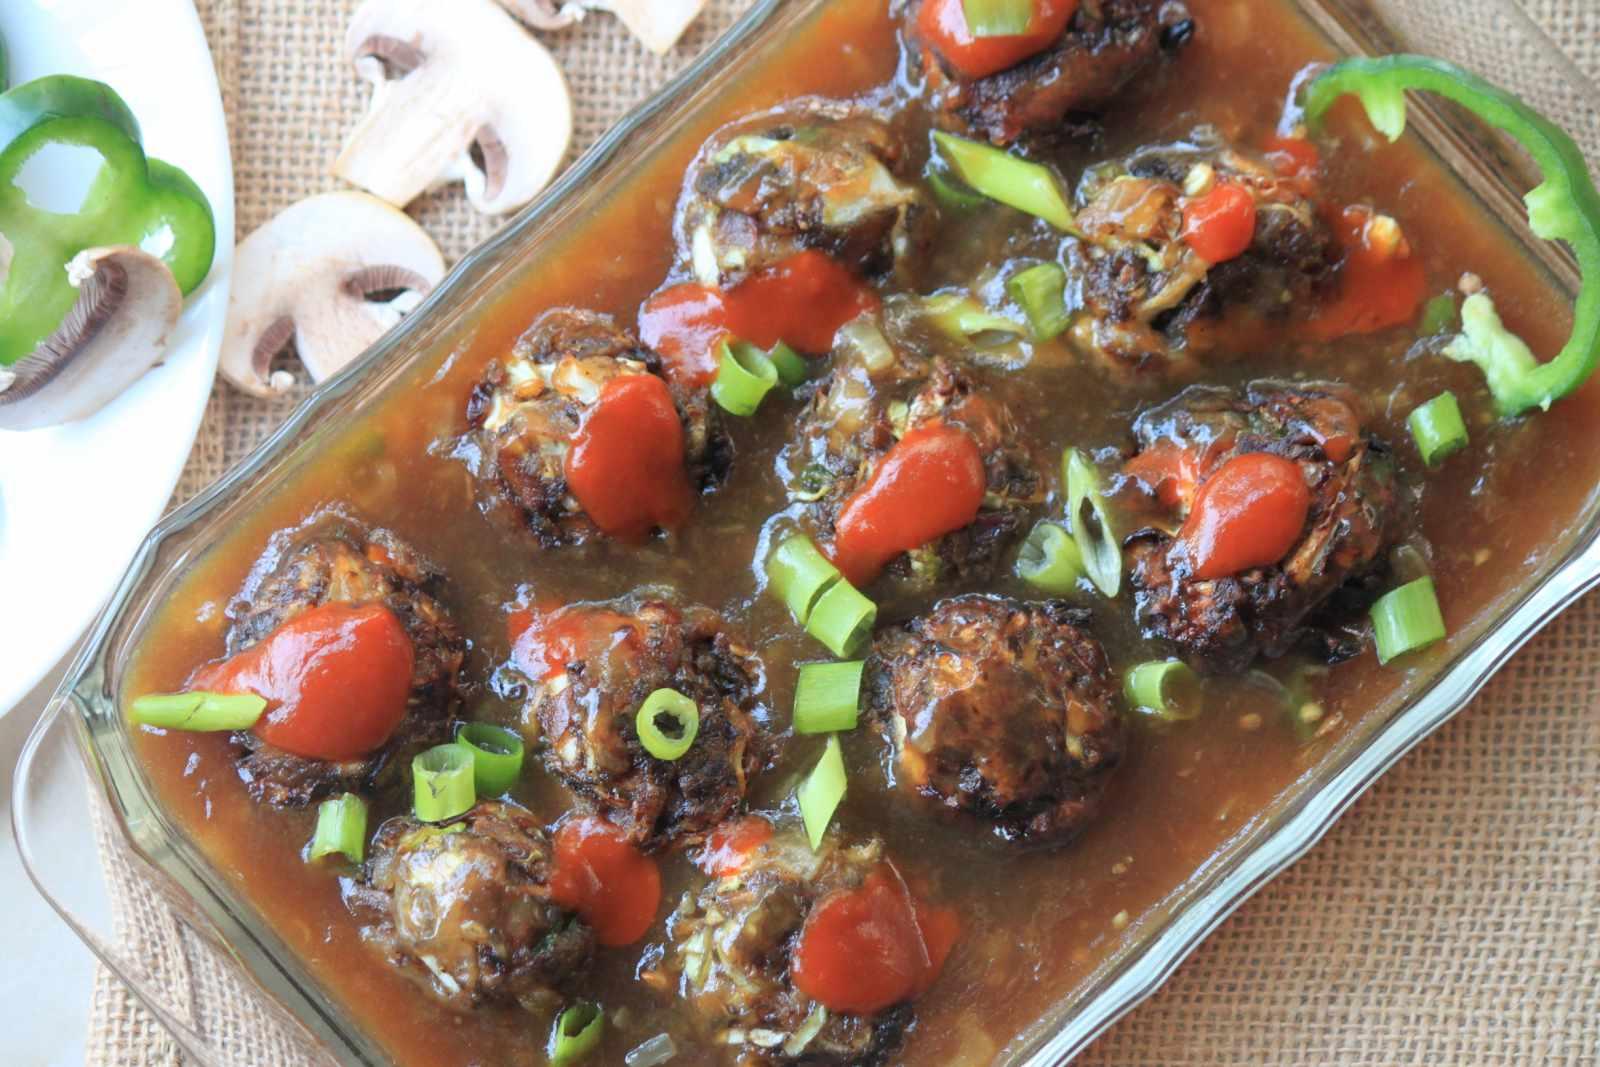 Mushroom manchurian gravy recipe by archanas kitchen mushroom manchurian gravy recipe forumfinder Image collections